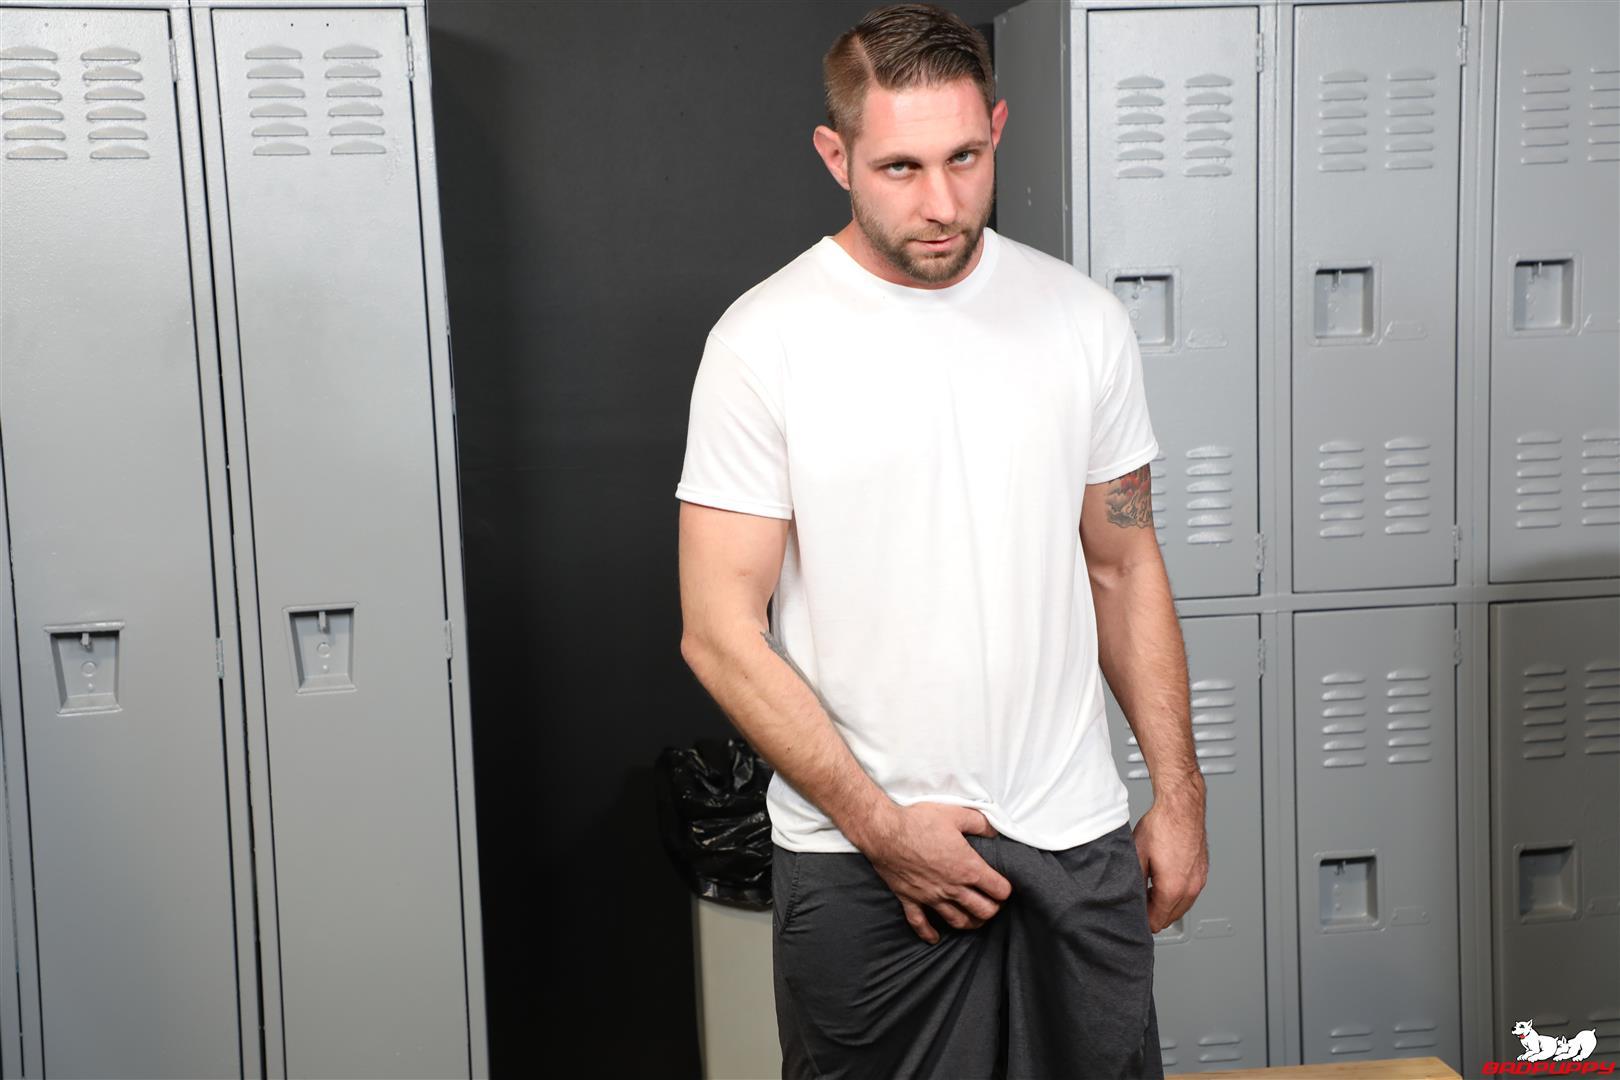 Badpuppy-Matt-Wingman-New-Yorker-With-A-Big-Cock-Jerking-Off-03 Sexy New Yorker Jerks Off His Big Cut Cock In The Locker Room